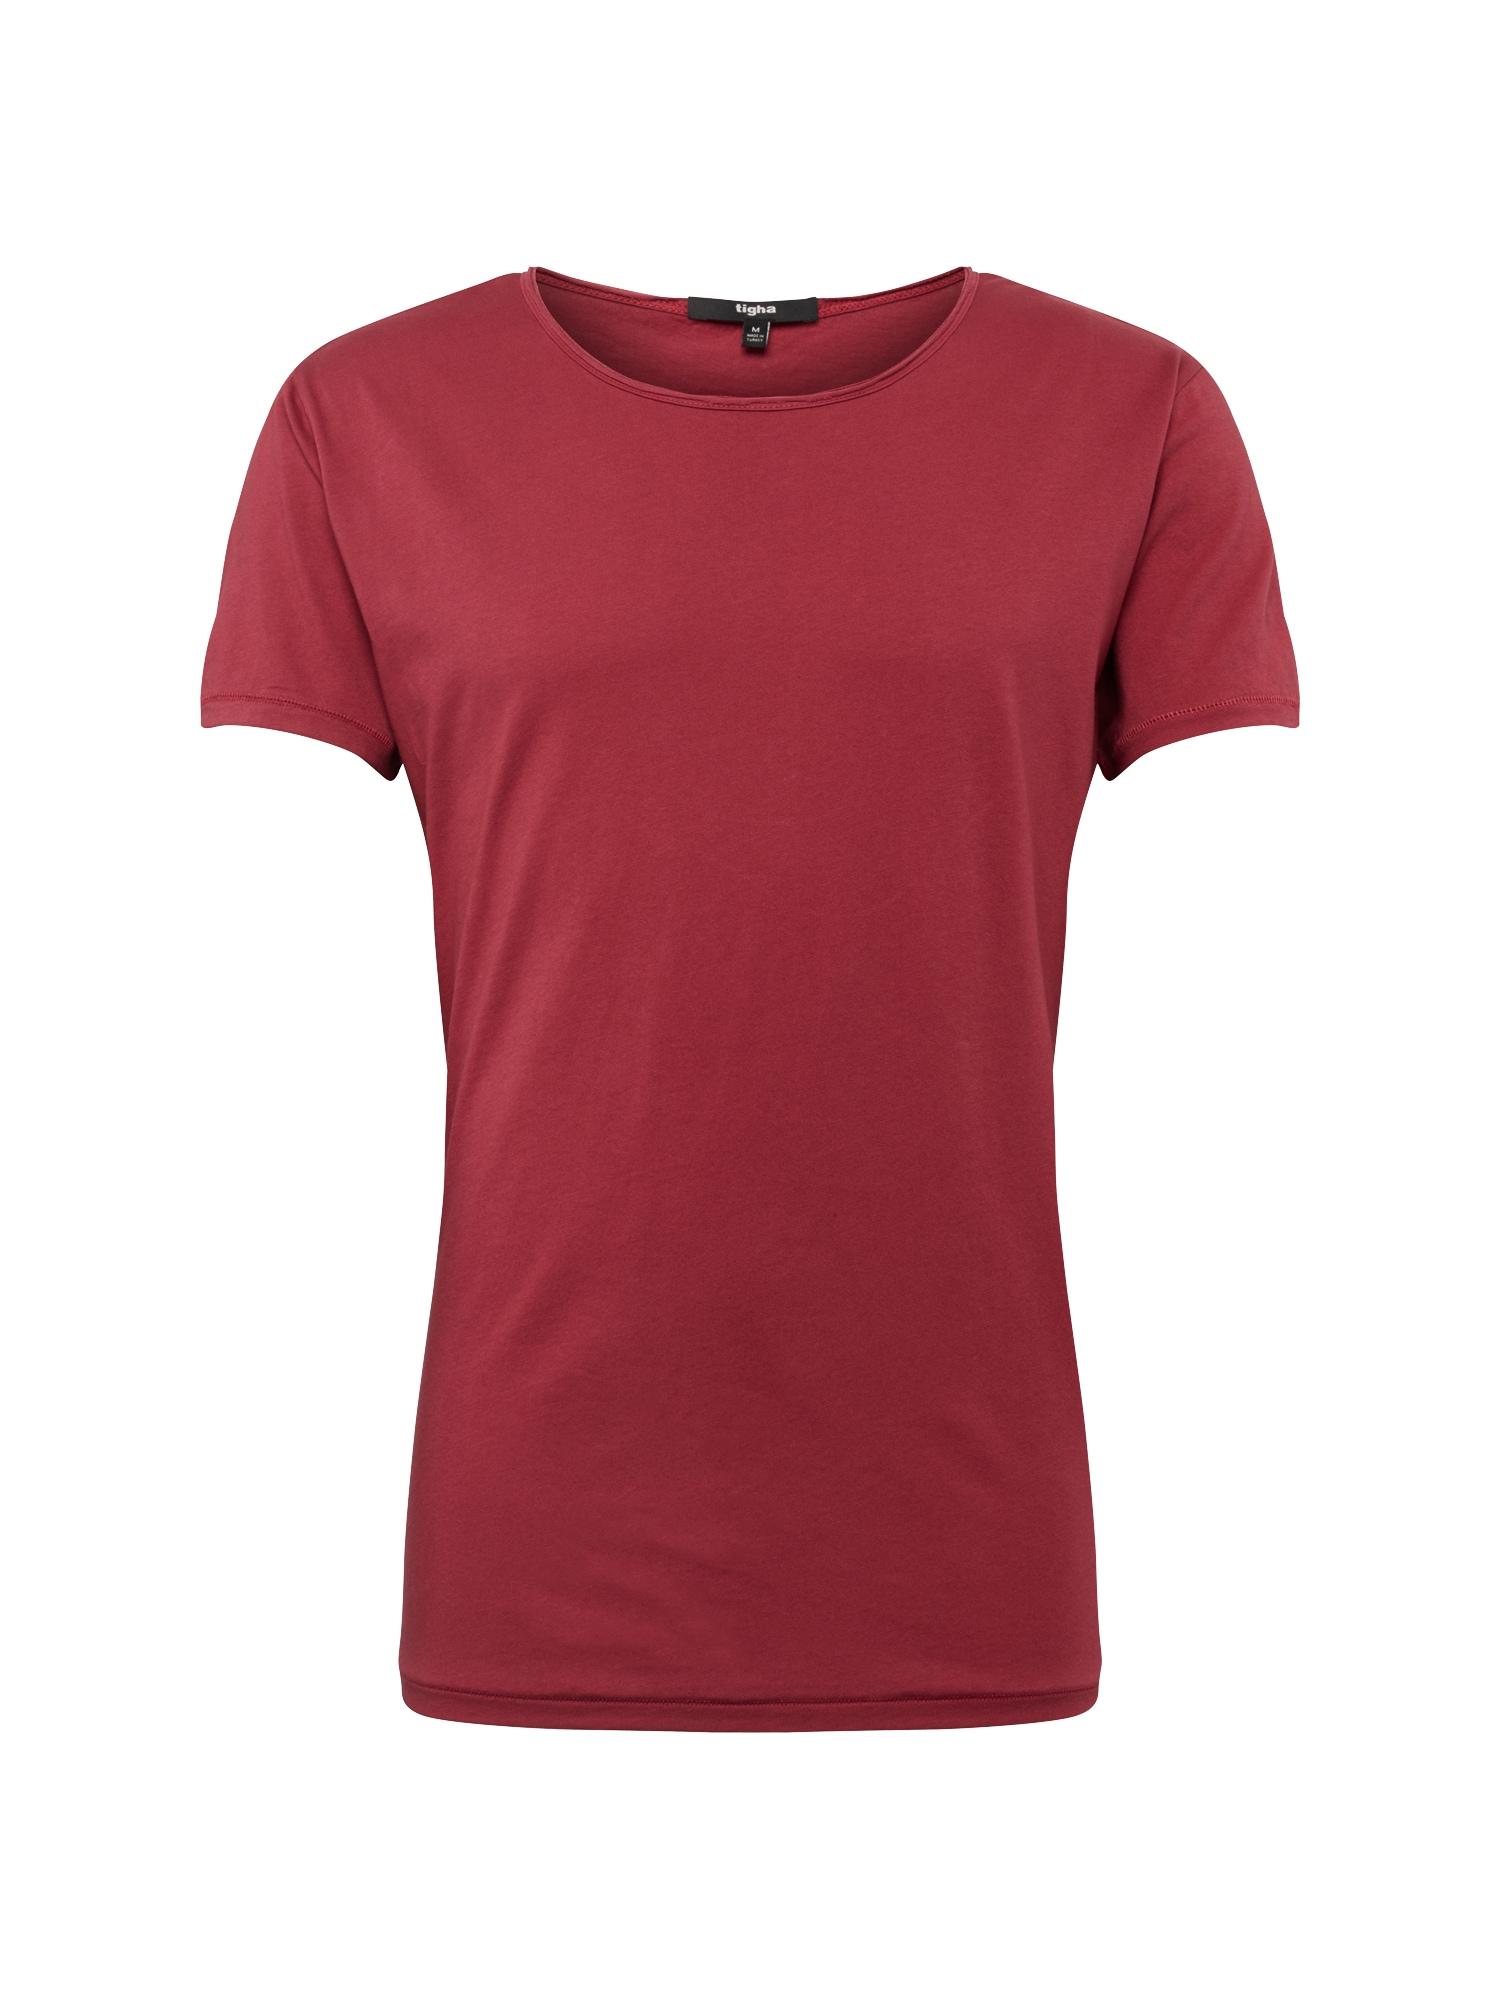 Tričko Wren červená Tigha